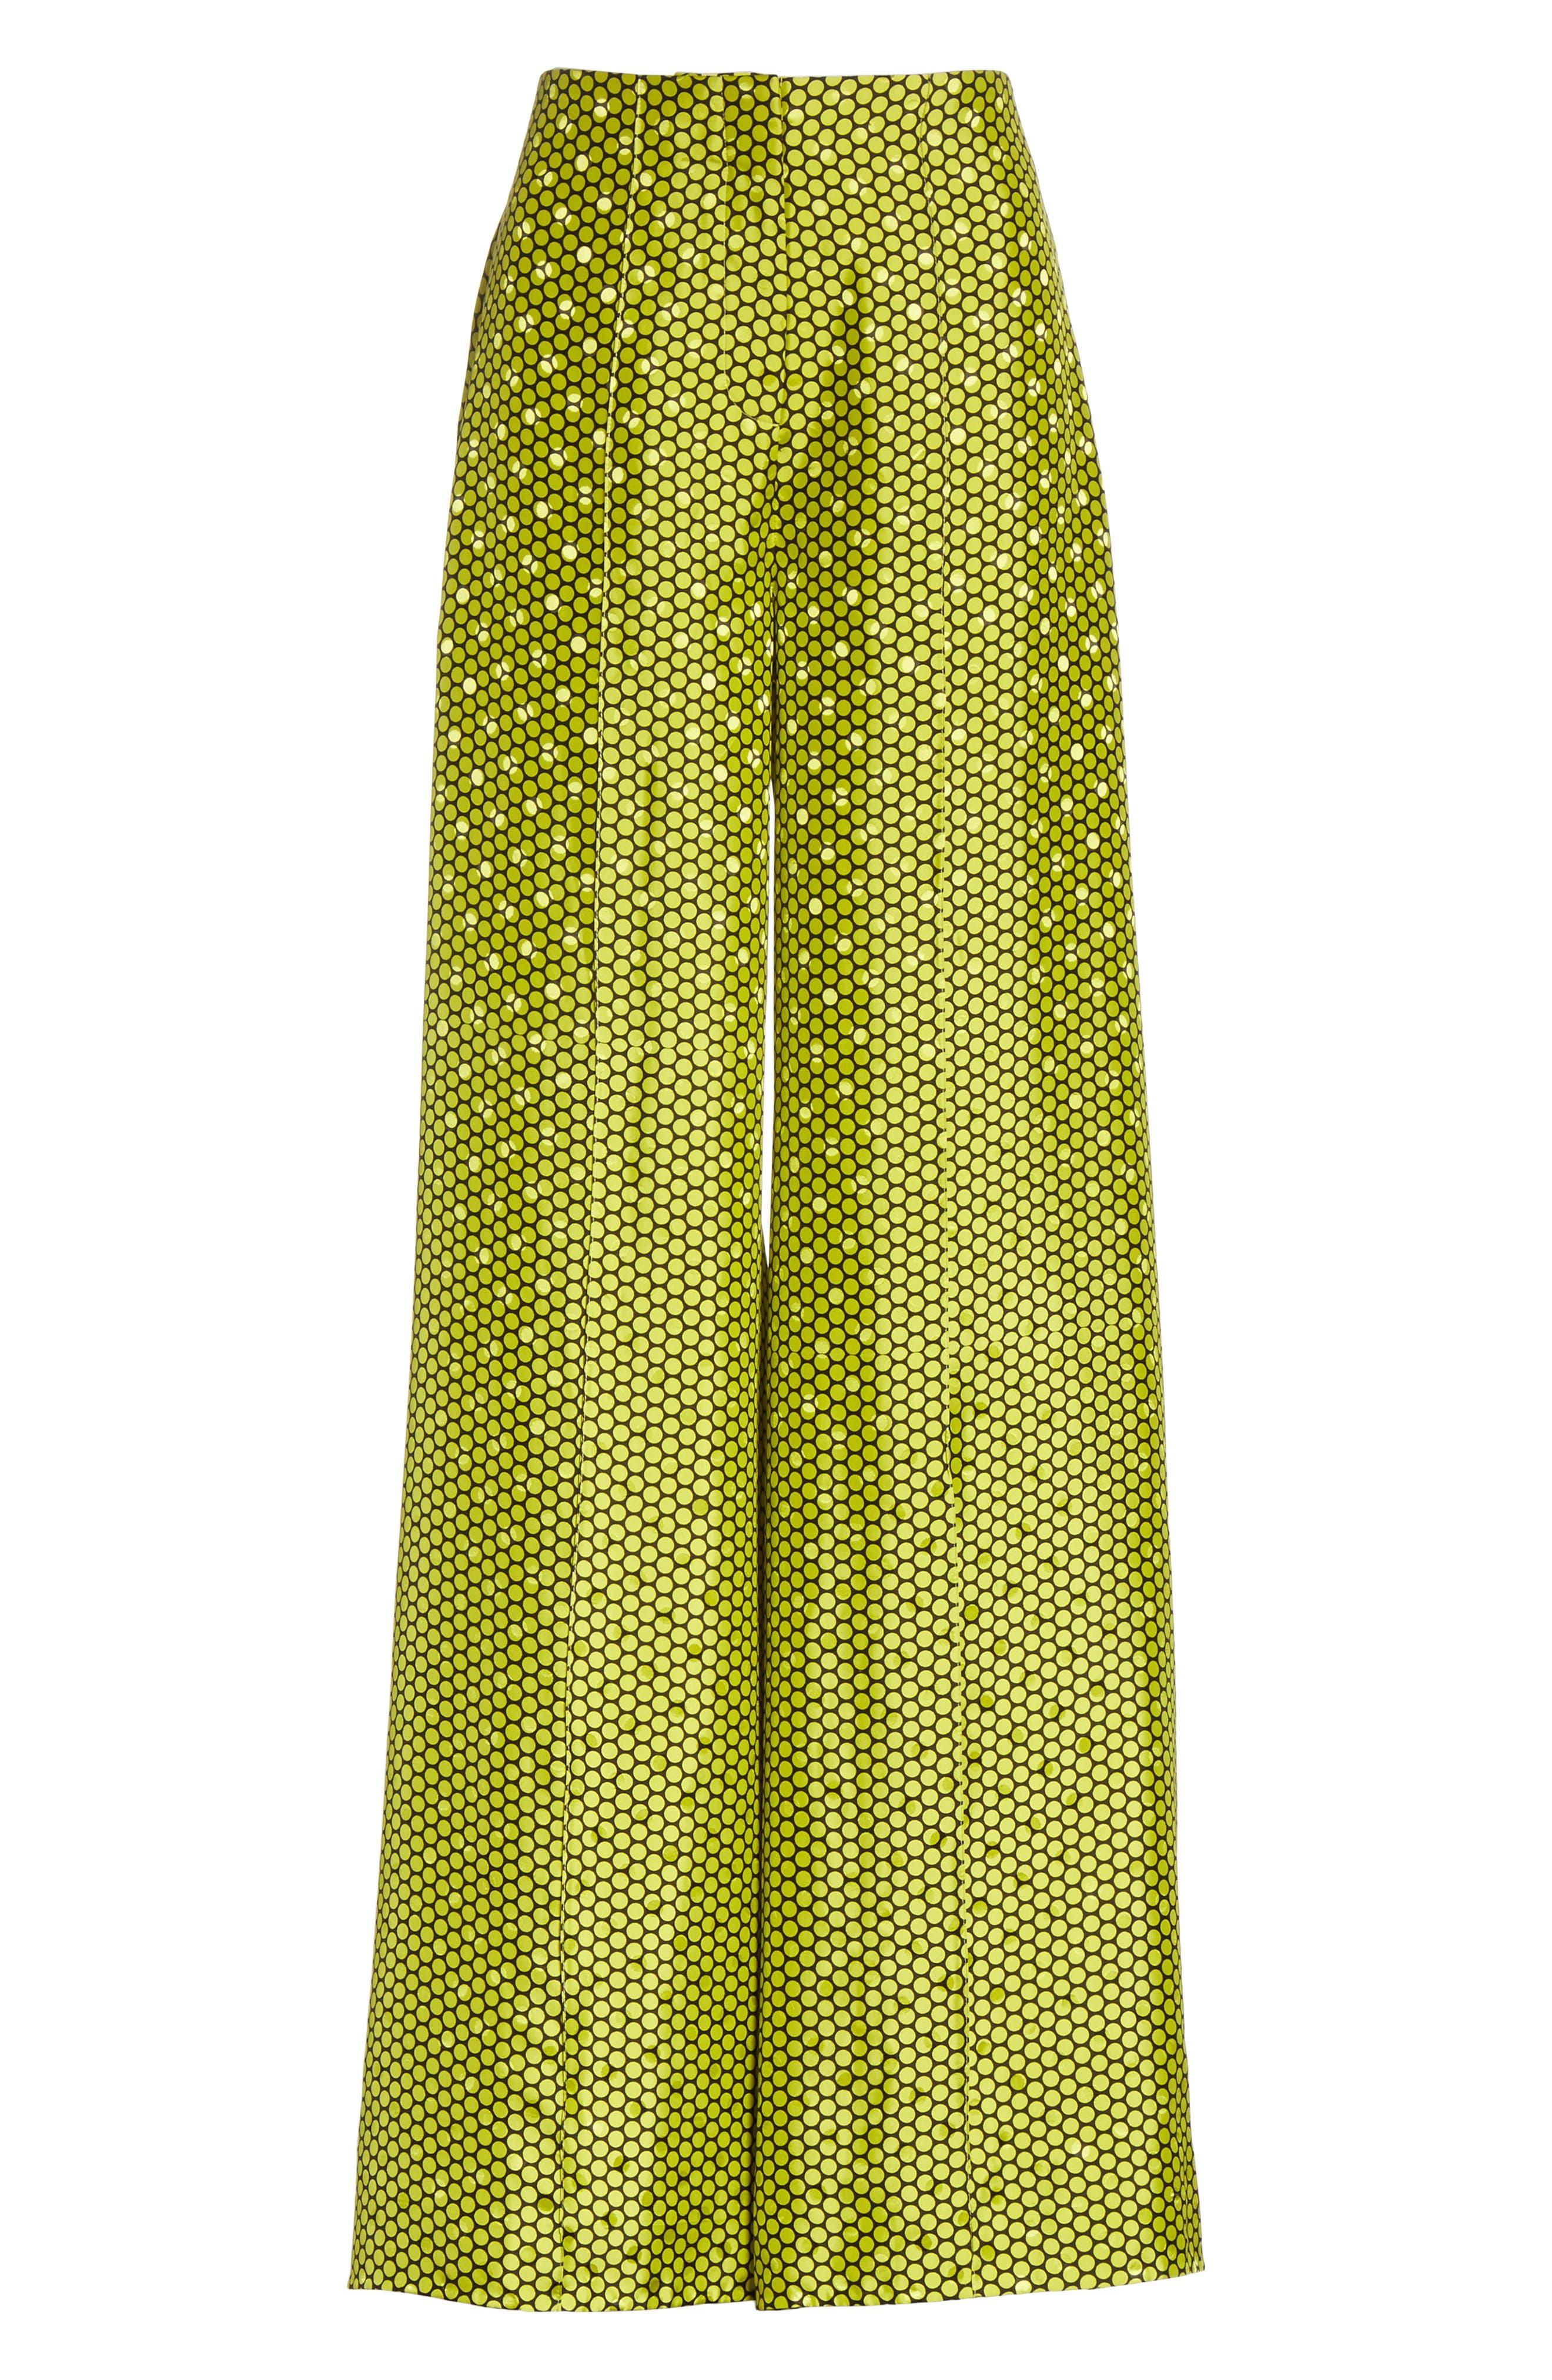 Diane von Furstenberg Dot Silk Palazzo Pants,                             Alternate thumbnail 6, color,                             390